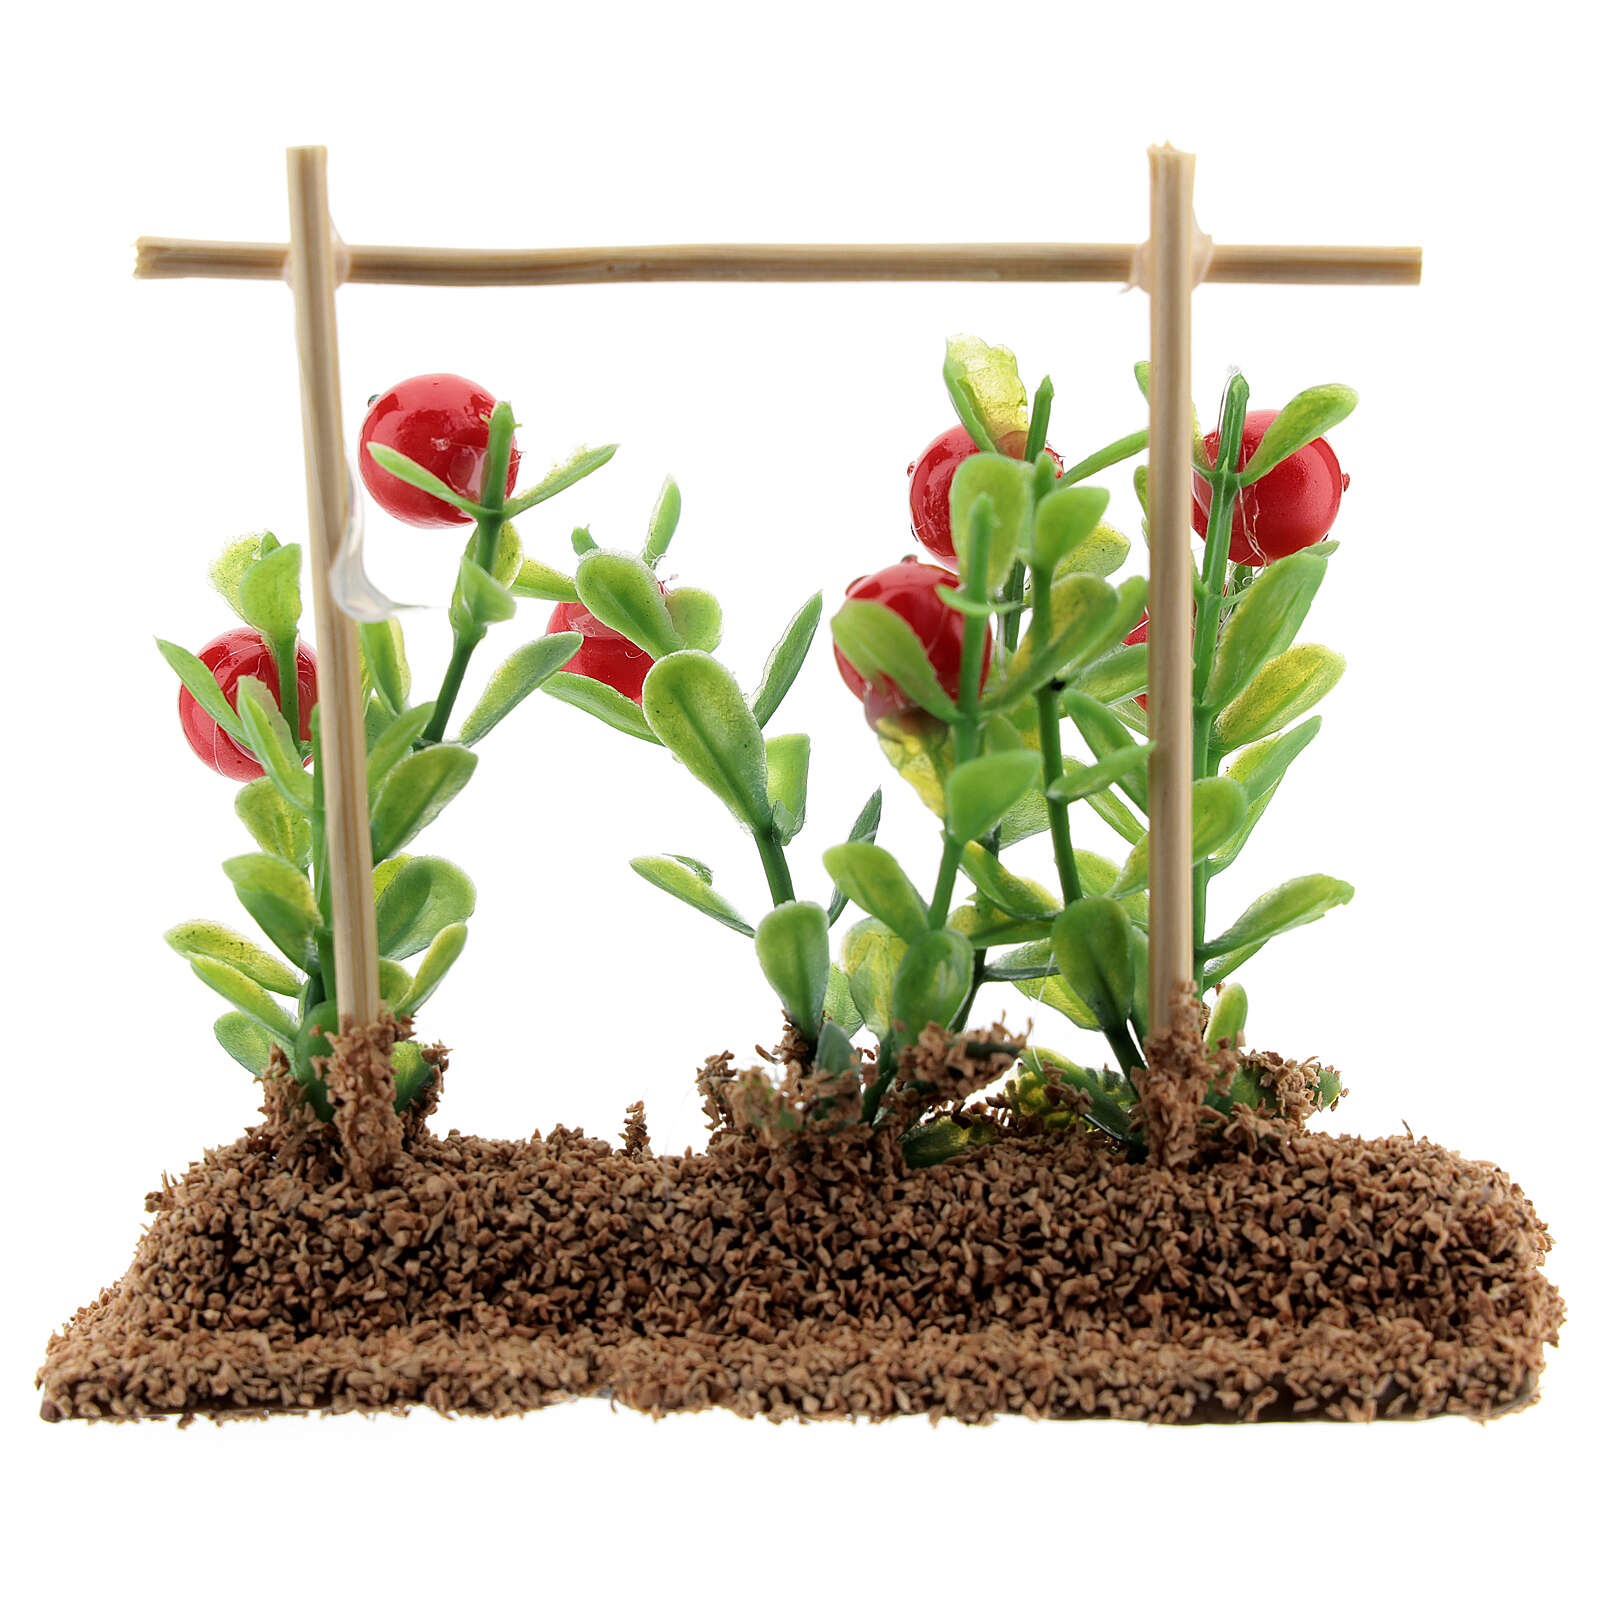 Vegetable garden tomatos 7x10x2 cm for Nativity Scene with 12-14 cm figurines 4